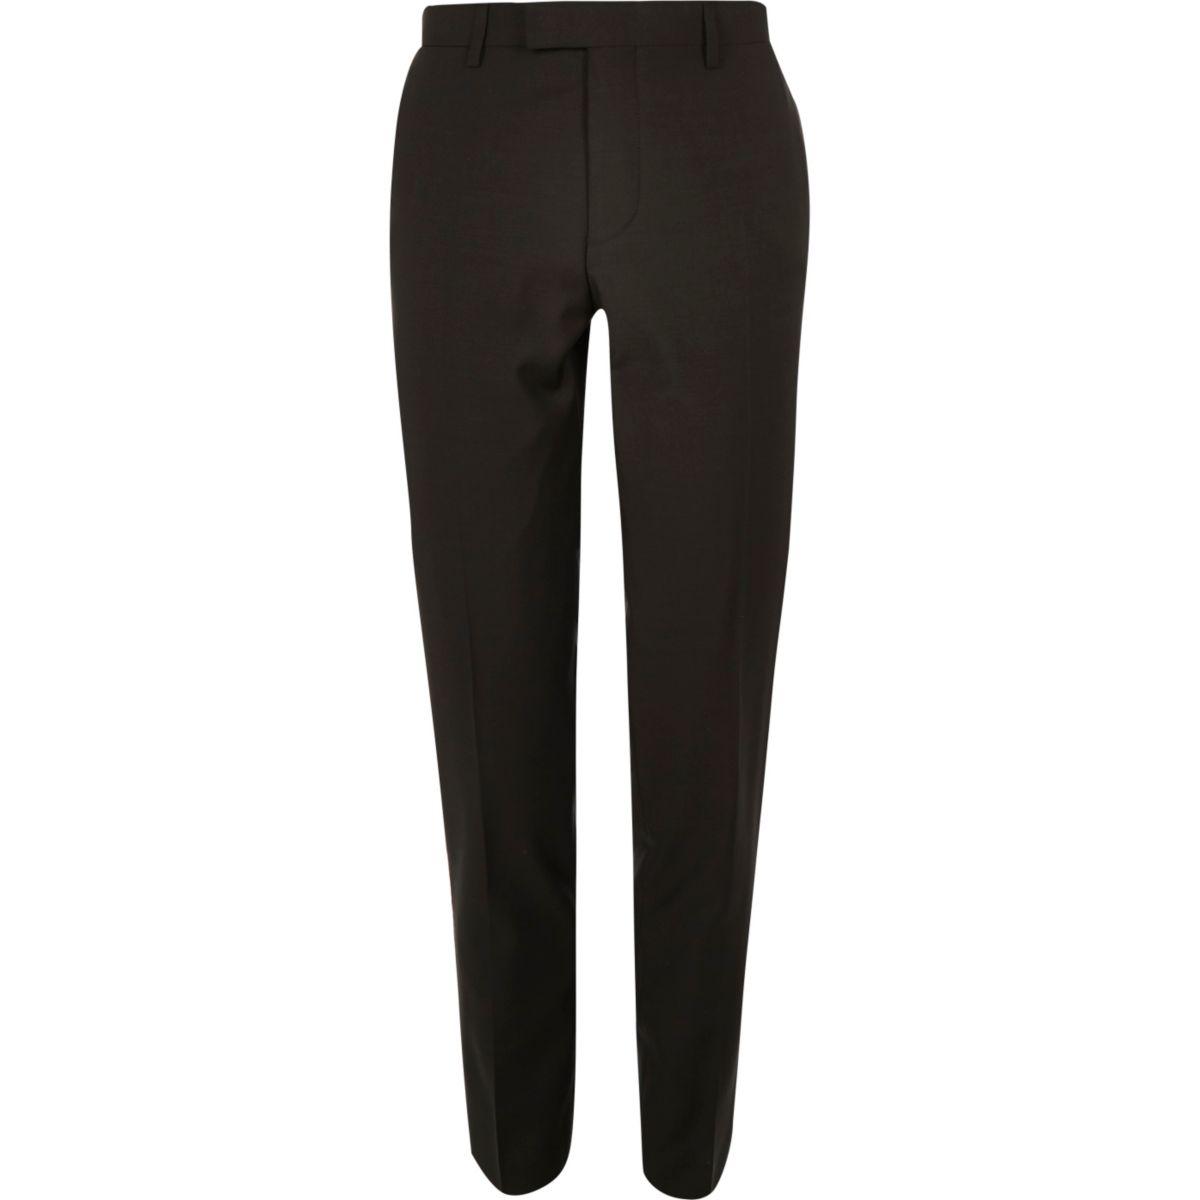 Khaki skinny fit suit trousers